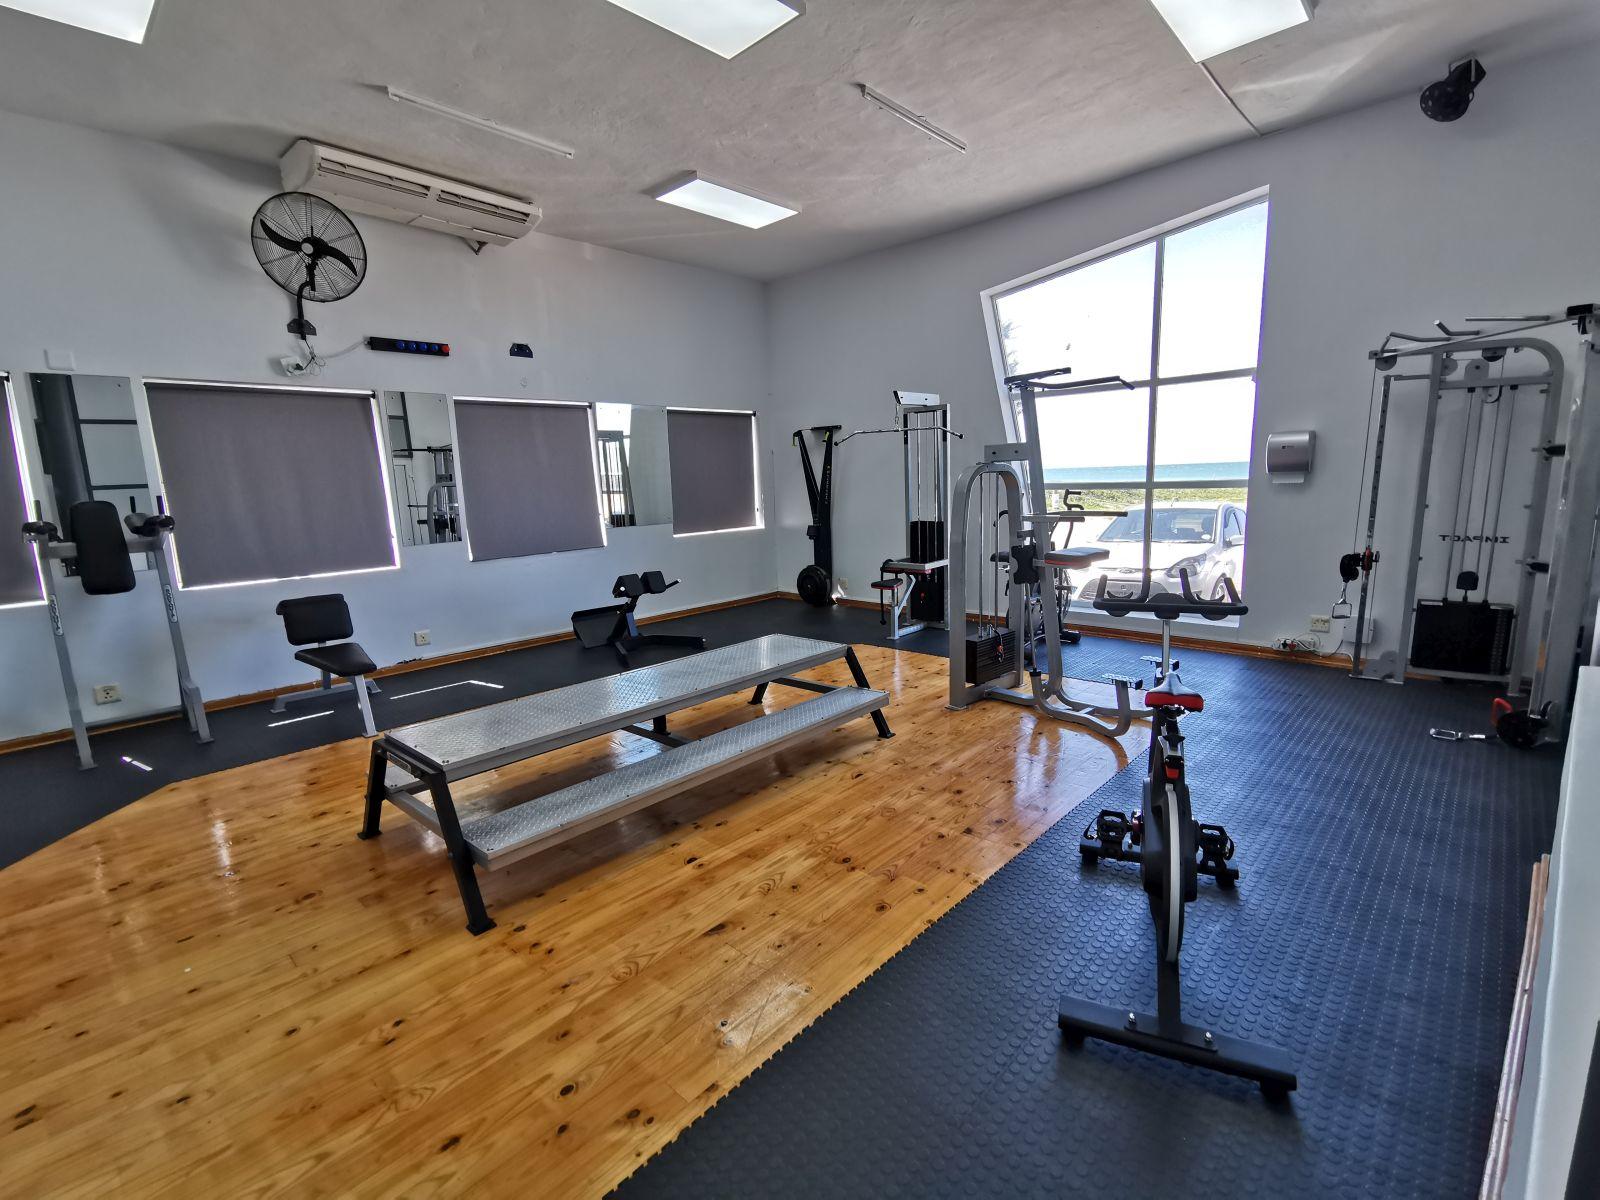 Xclusive Fitness Img 20200828 124102